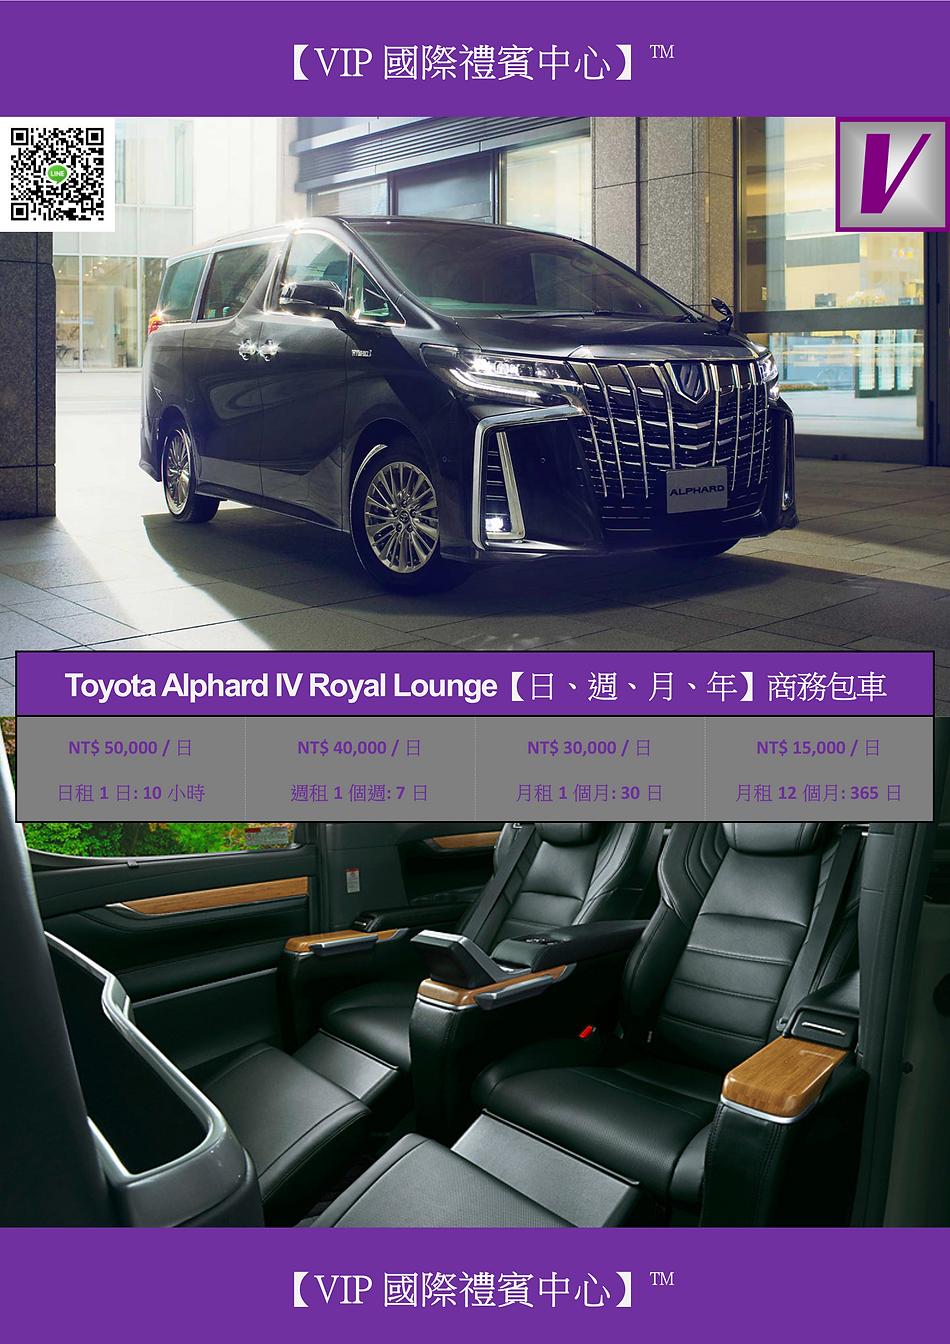 VIP國際禮賓中心 TOYOTA ALPHARD IV ROYAL LOUNGE 臺北市區接送包車